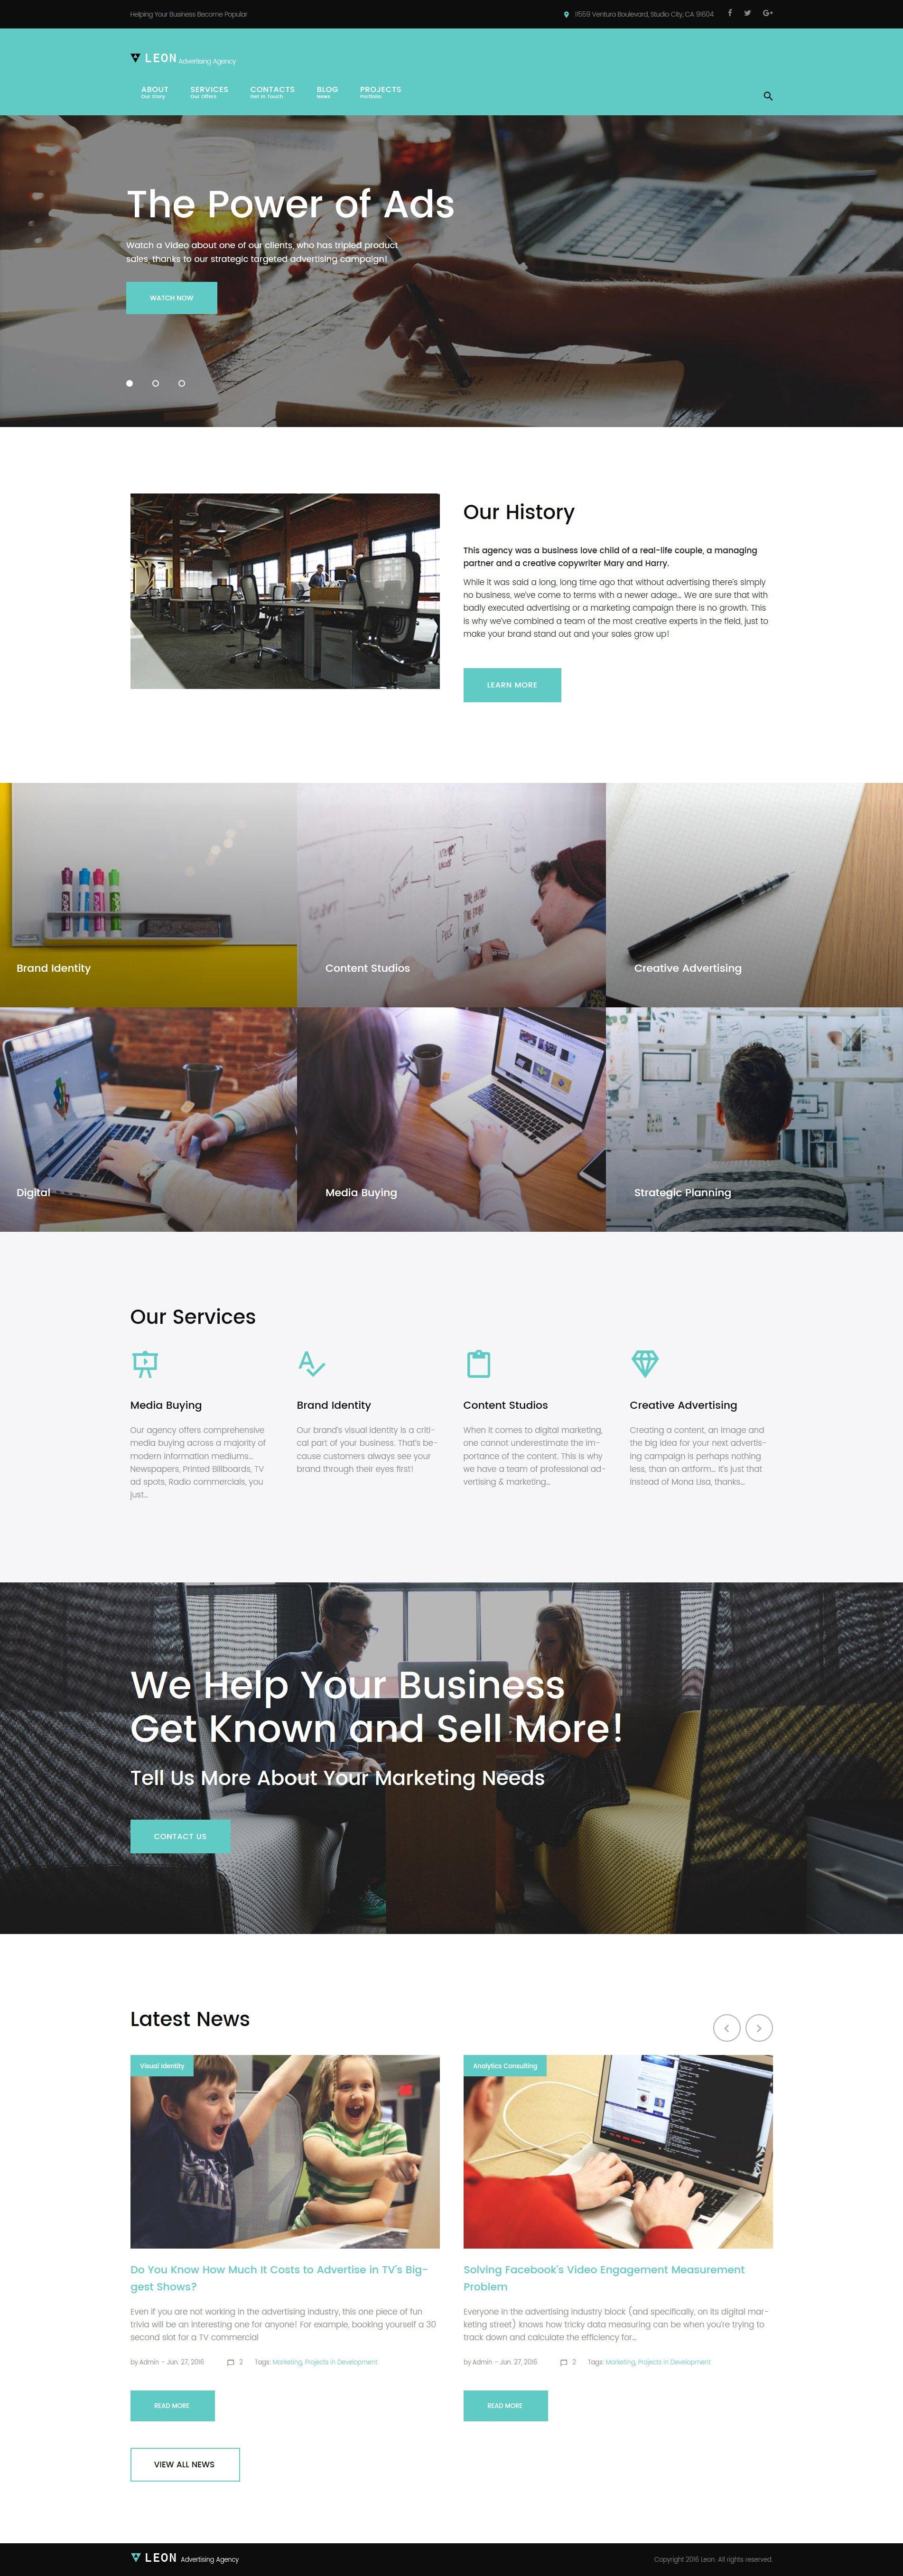 Leon - advertising, marketing and SEO agency WordPress Theme - screenshot